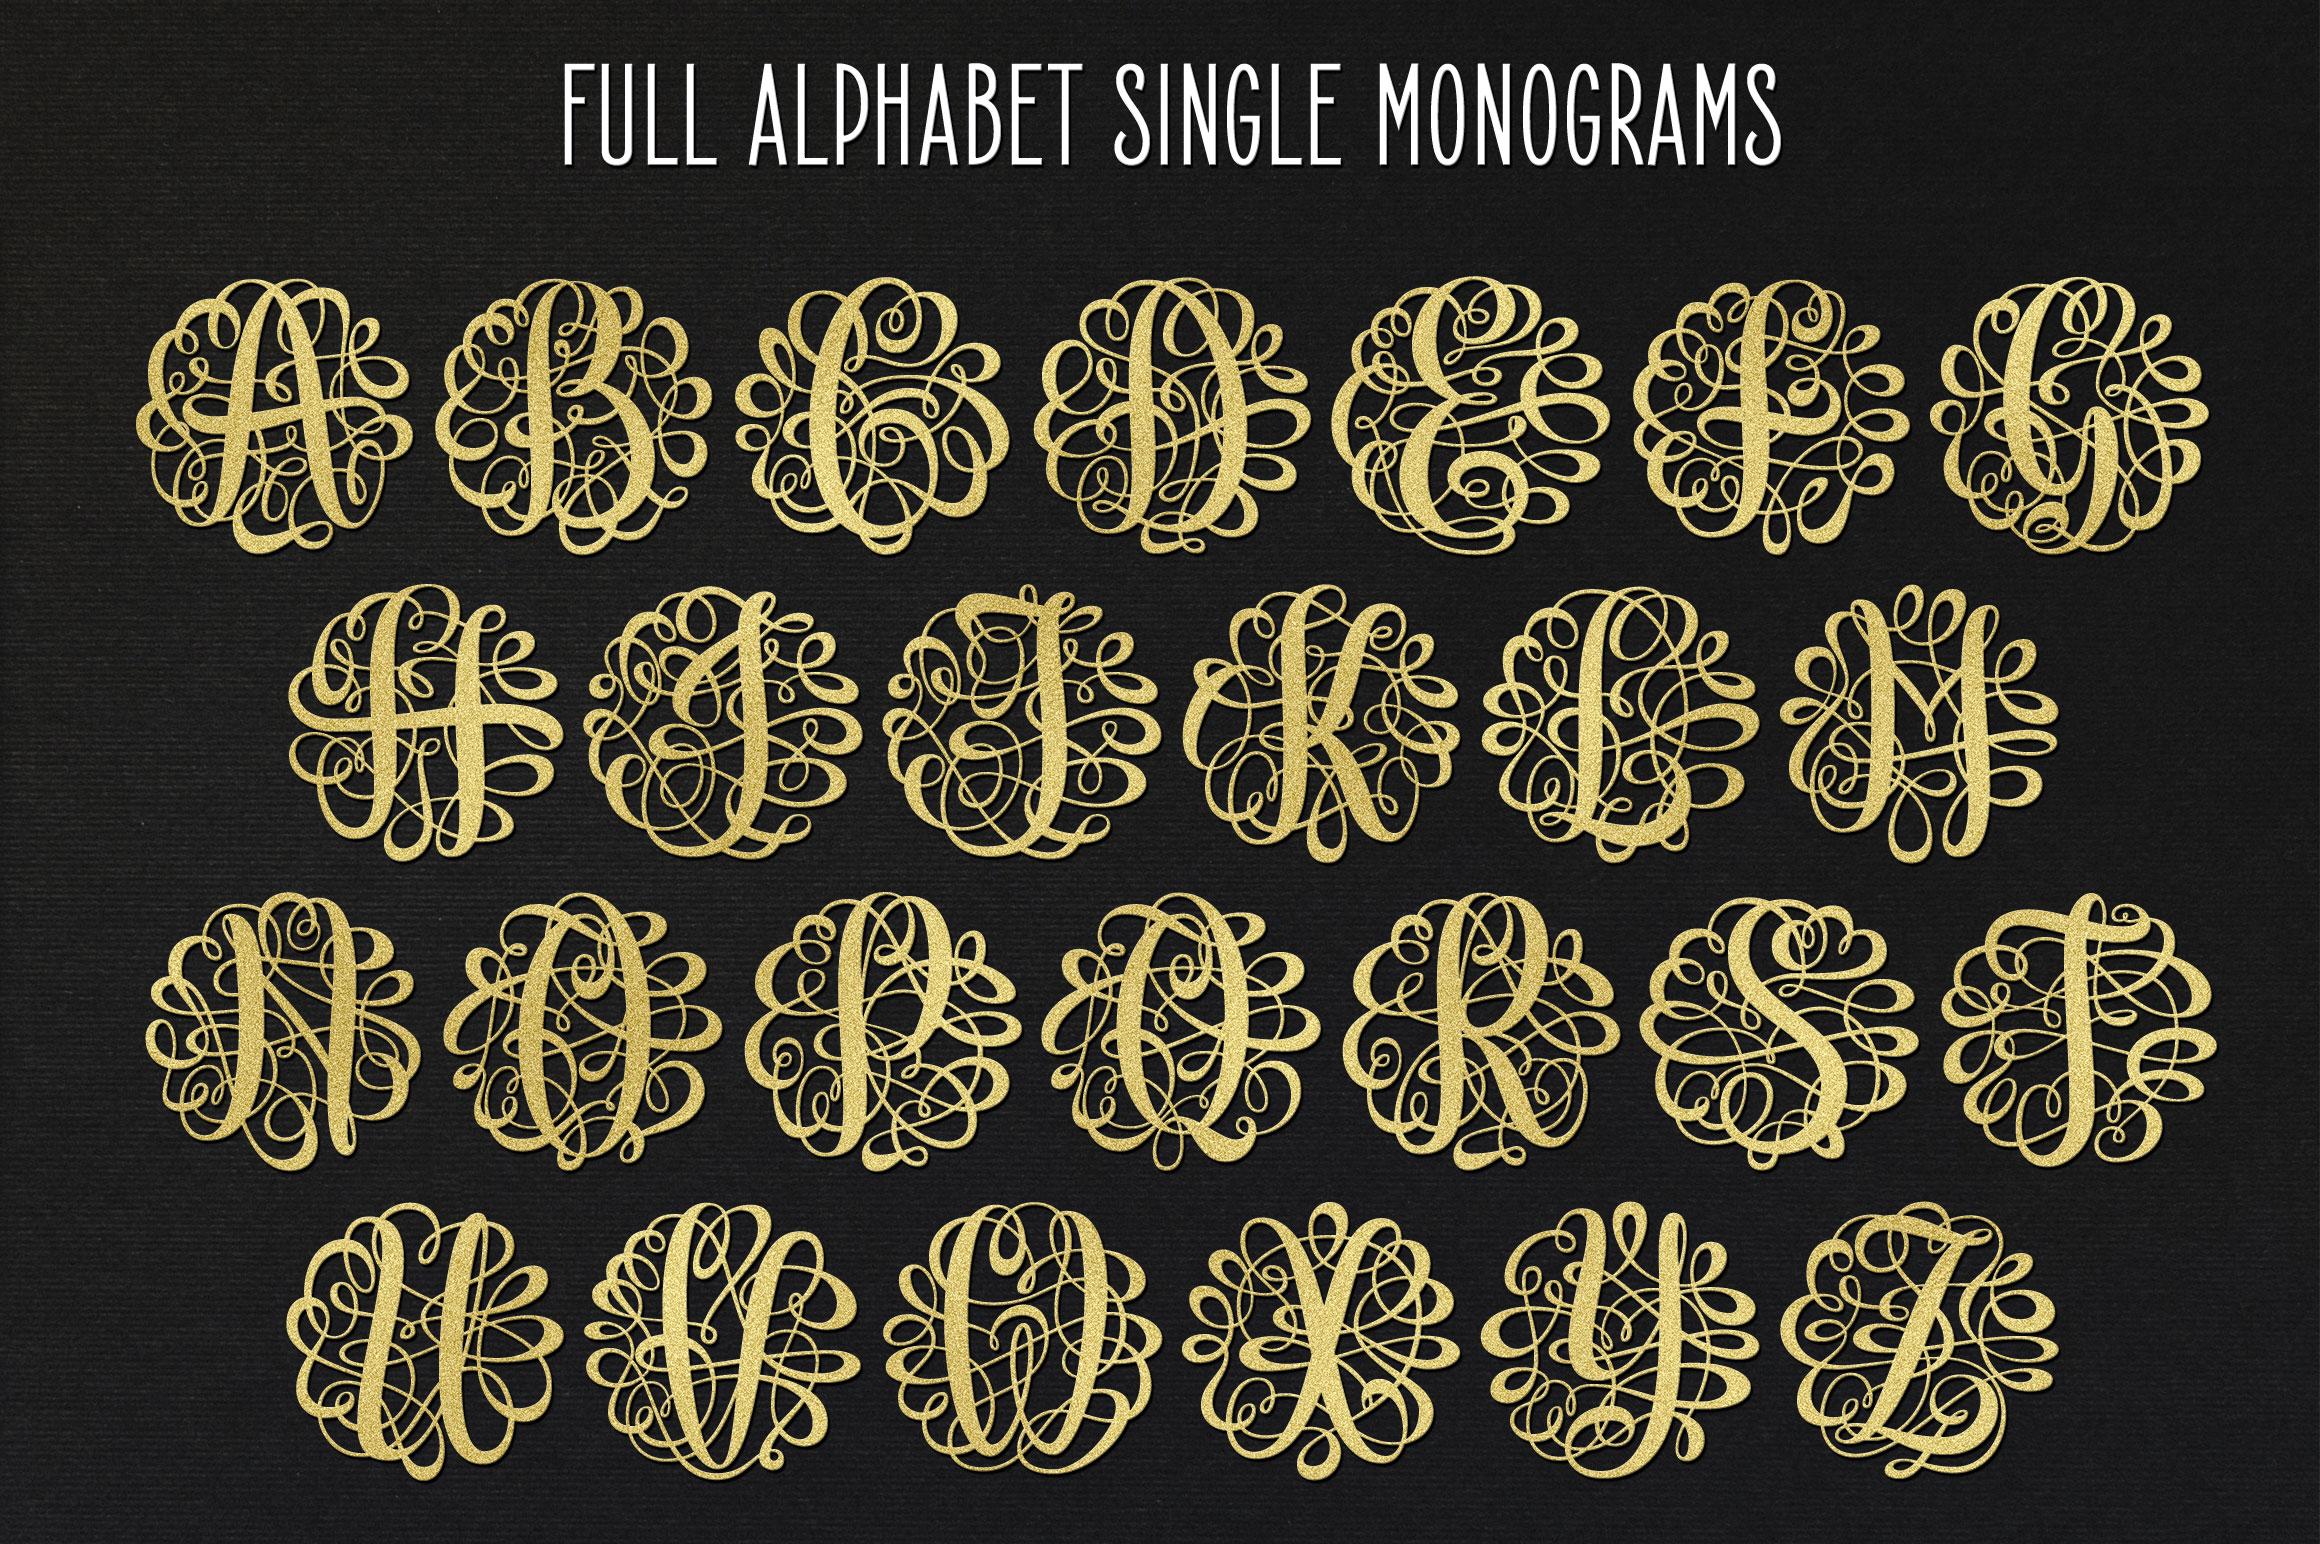 Monogram Script | Full Alphabet Single & Couple Monograms example image 9